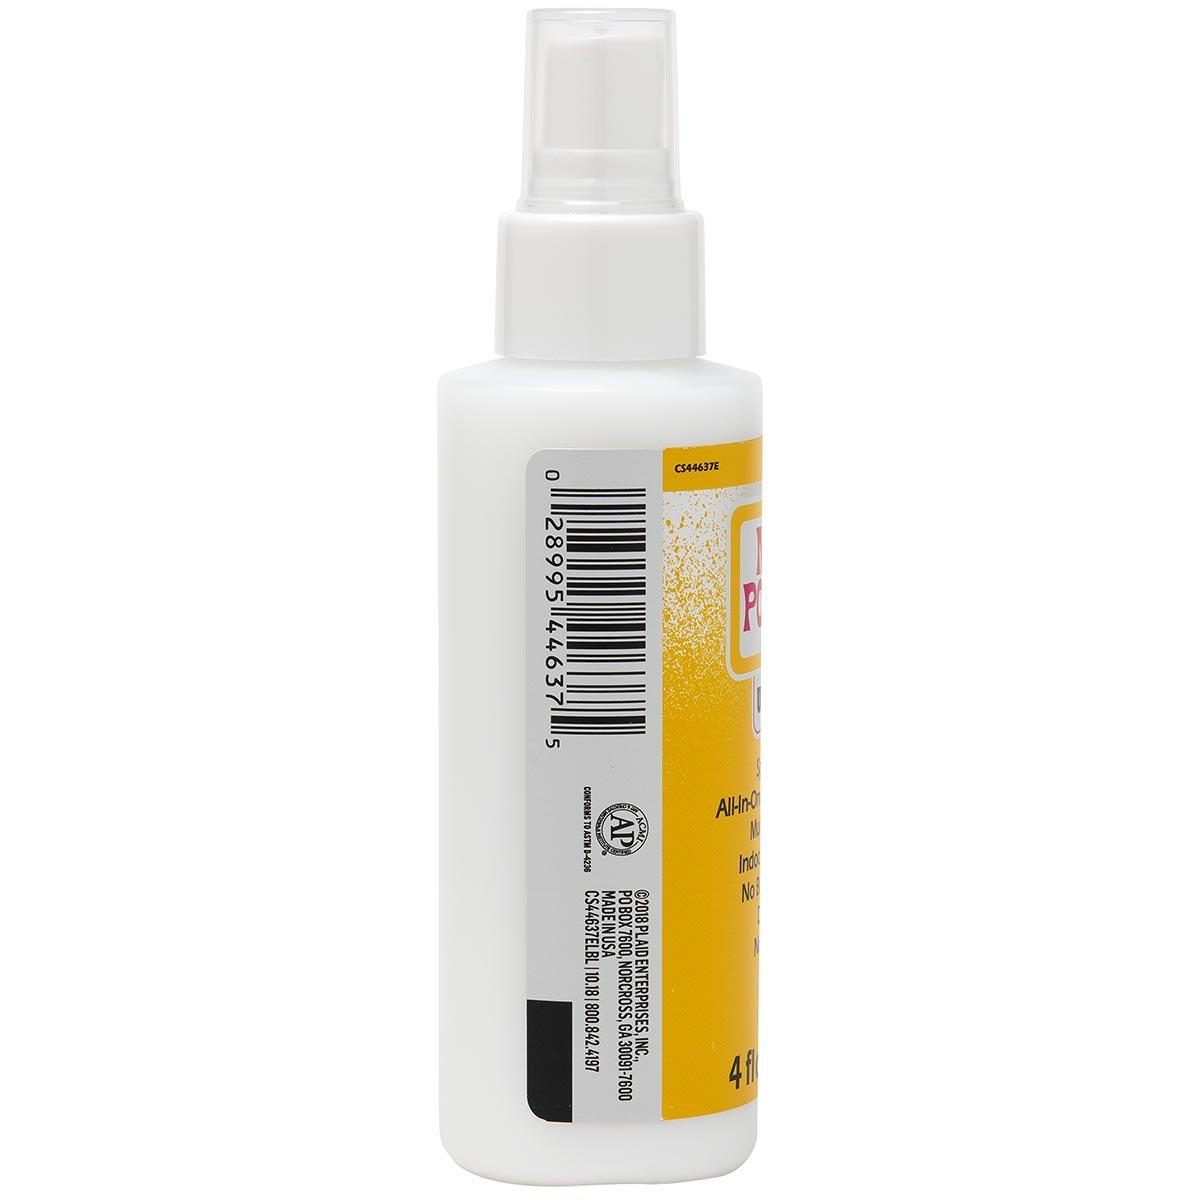 Mod Podge ® Ultra Matte, 4 oz. - CS44637